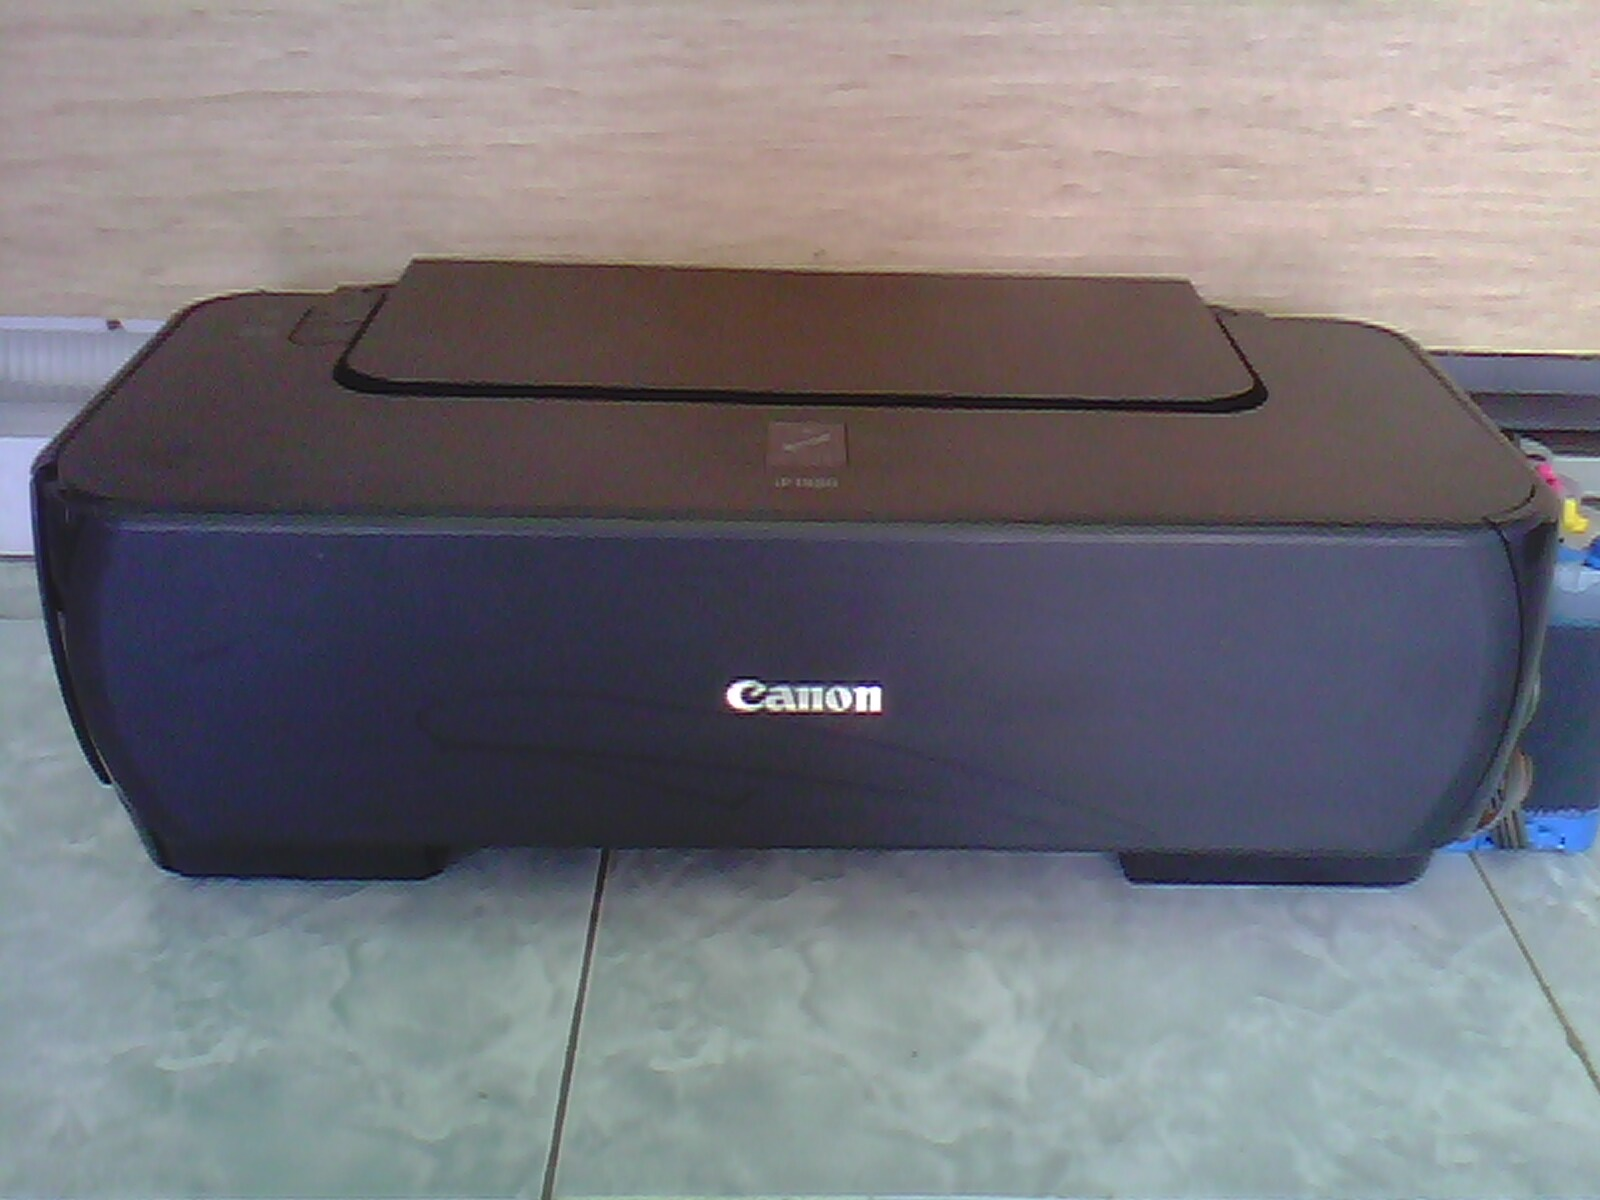 canon ip1980 canon ip1980 kondisi mesin ok 90 % catrit warna cl 41 95 ...